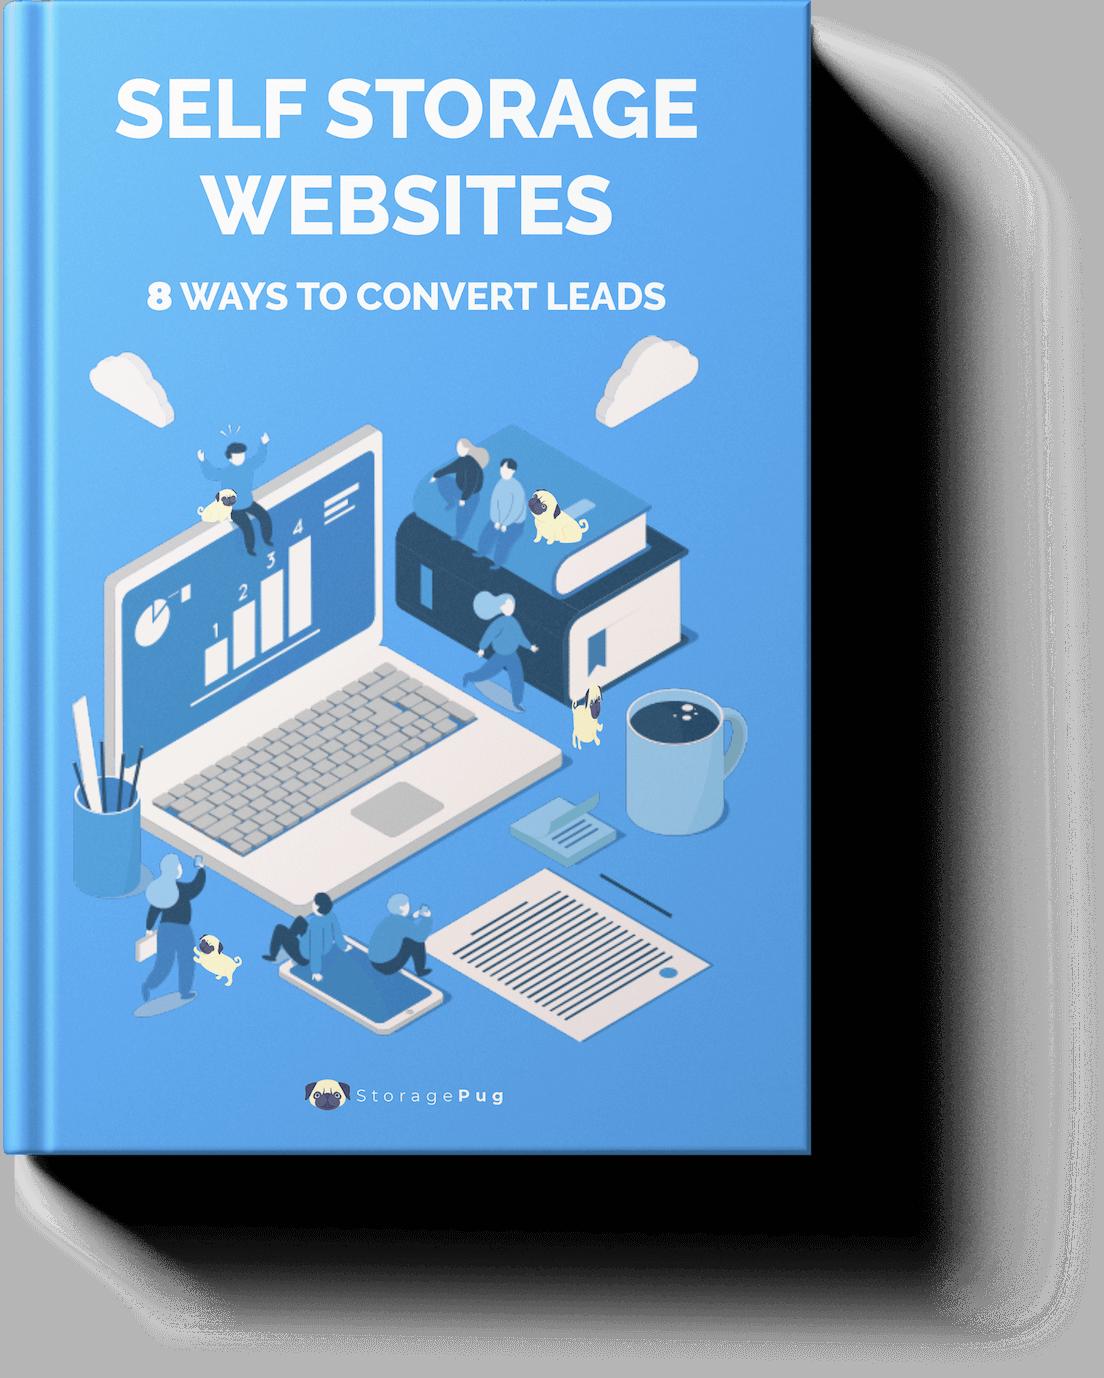 Self Storage Websites eBook Cover